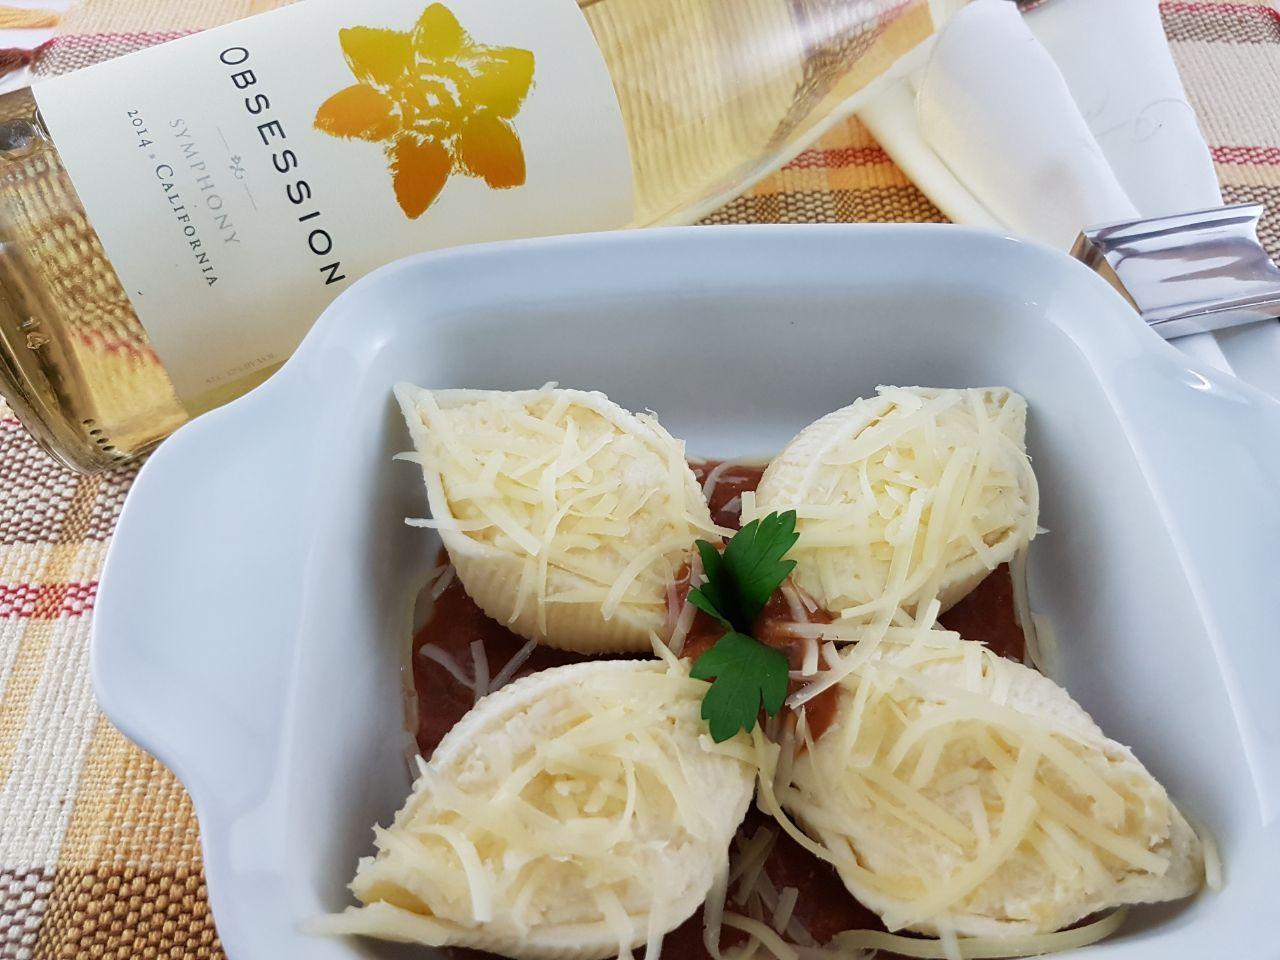 Kit Conchiglione 4 queijos Nova Benta 600g + - Vinho Obsession Symphony Ironstone Branco 750ml